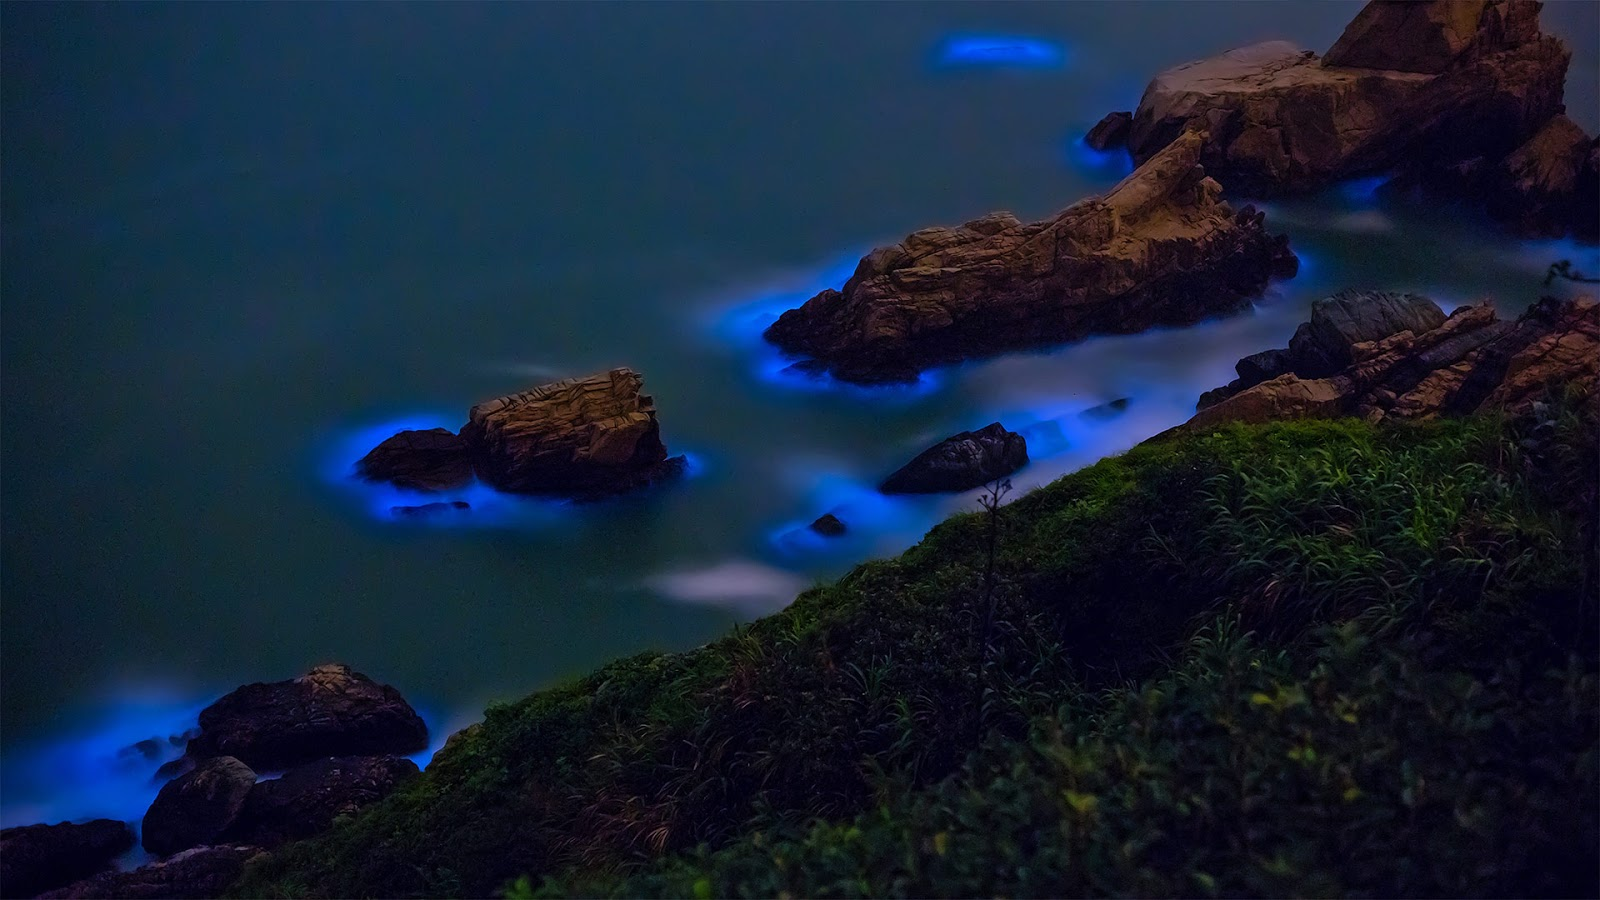 Bioluminescent algae shores Matsu Islands coast Taiwan © Wan Ru Chen/Getty Images